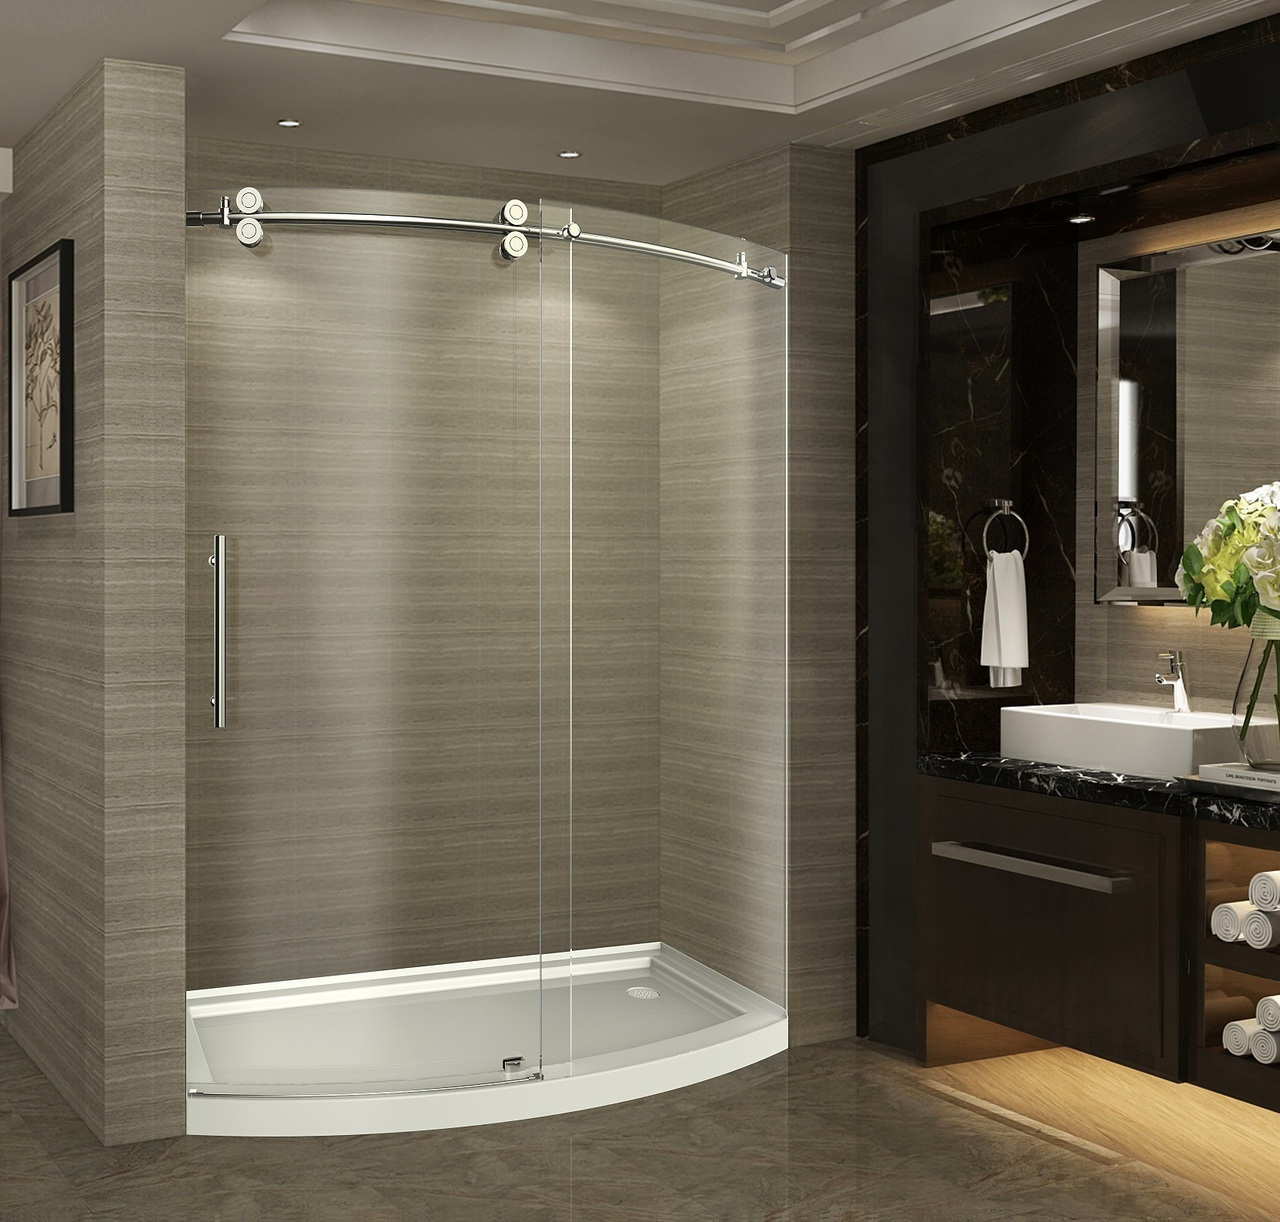 60 Zenarch Completely Frameless Bowfront Sliding Shower Door No Base Platinum Bath